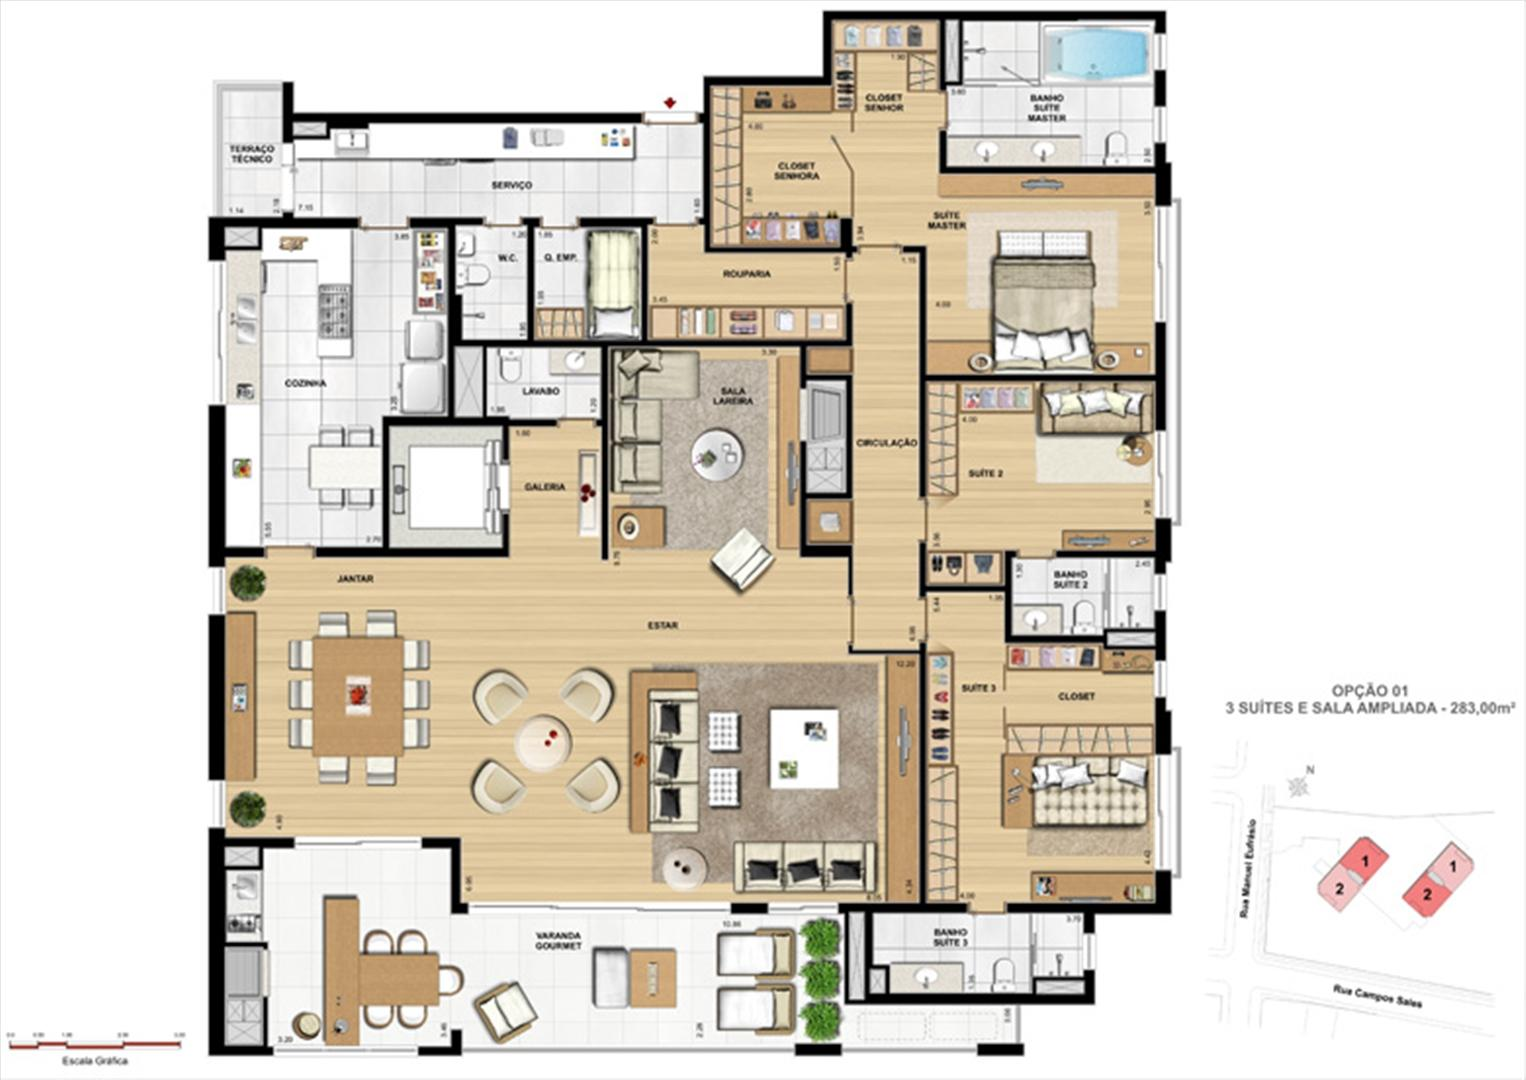 Sala ampliada | Le Chateau  – Apartamento no  Juvevê - Curitiba - Paraná